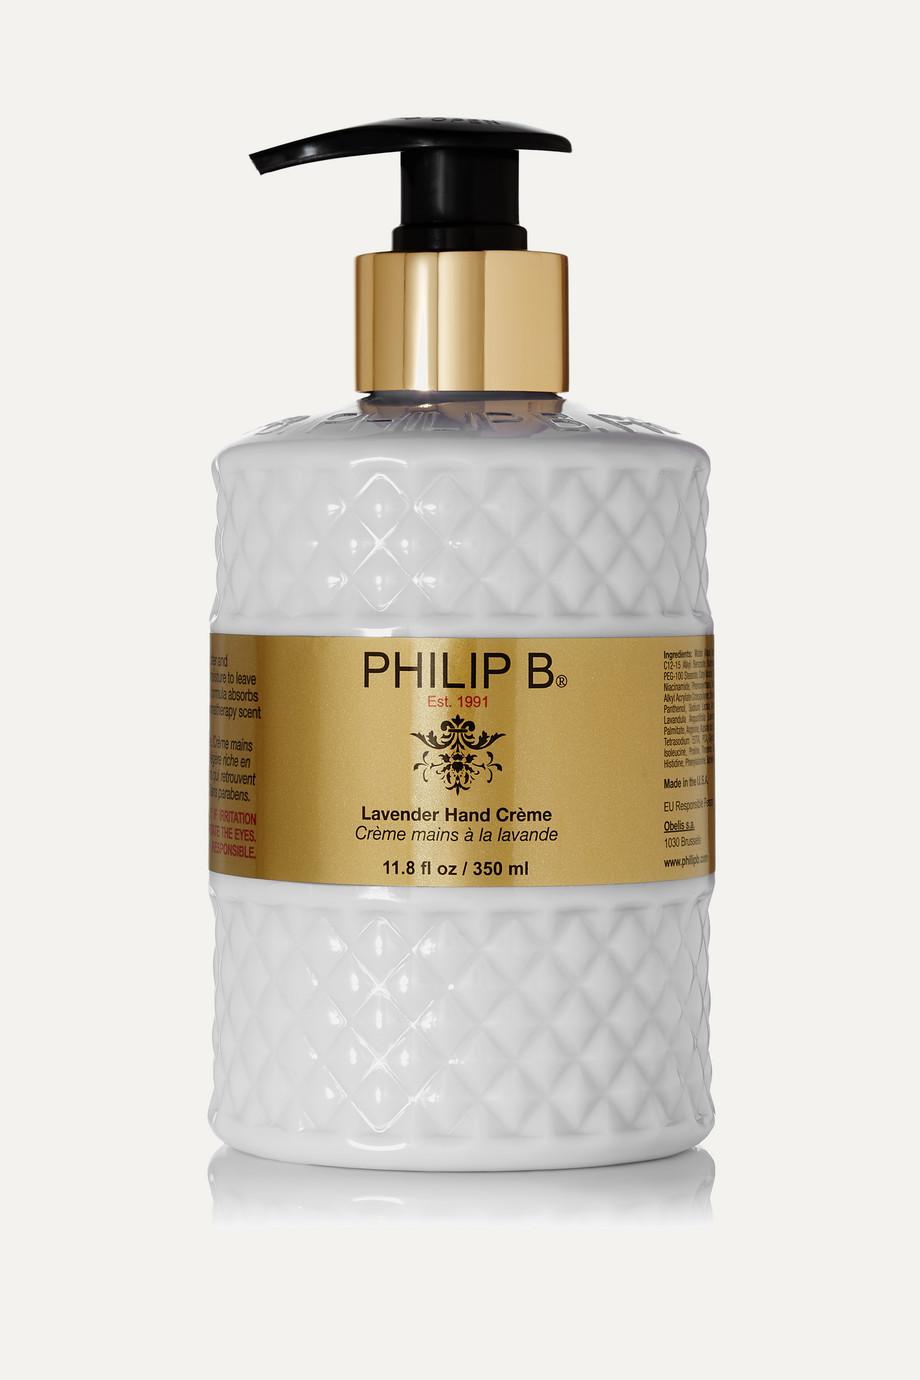 Lavender Hand Crème, 350ml, by Philip B